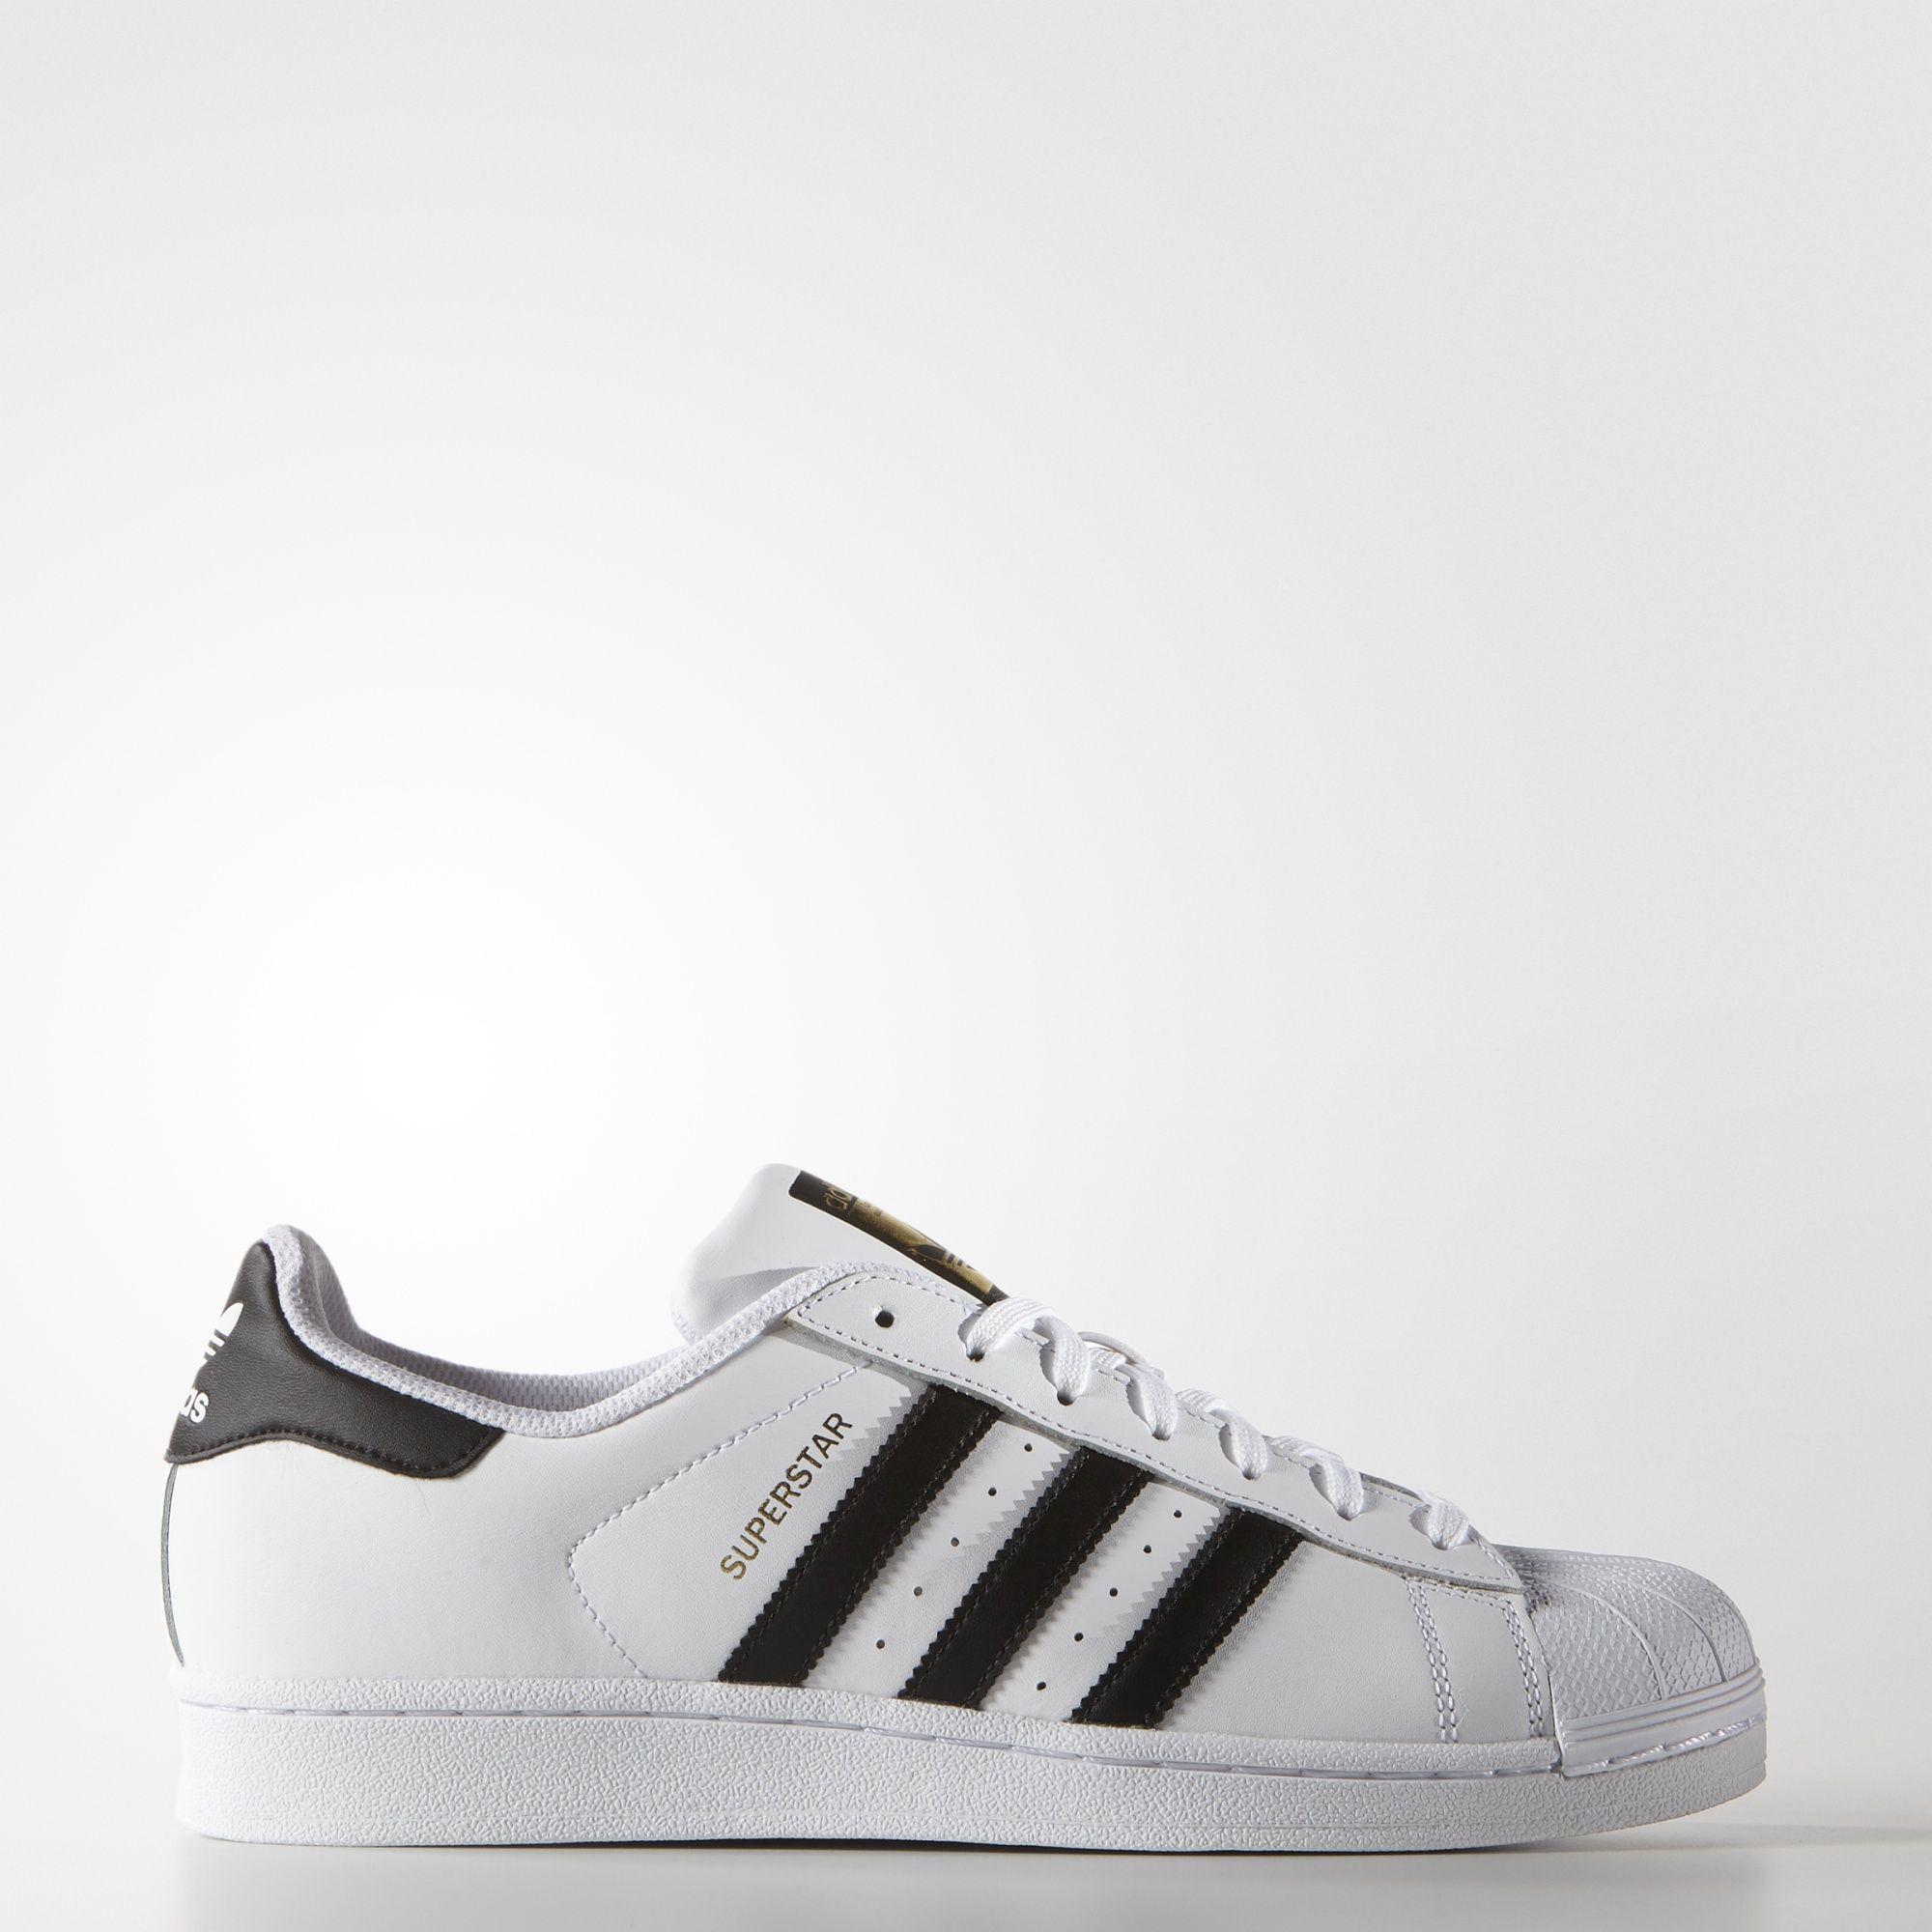 Adidas roma | Swag men, Adidas, Adidas sneakers